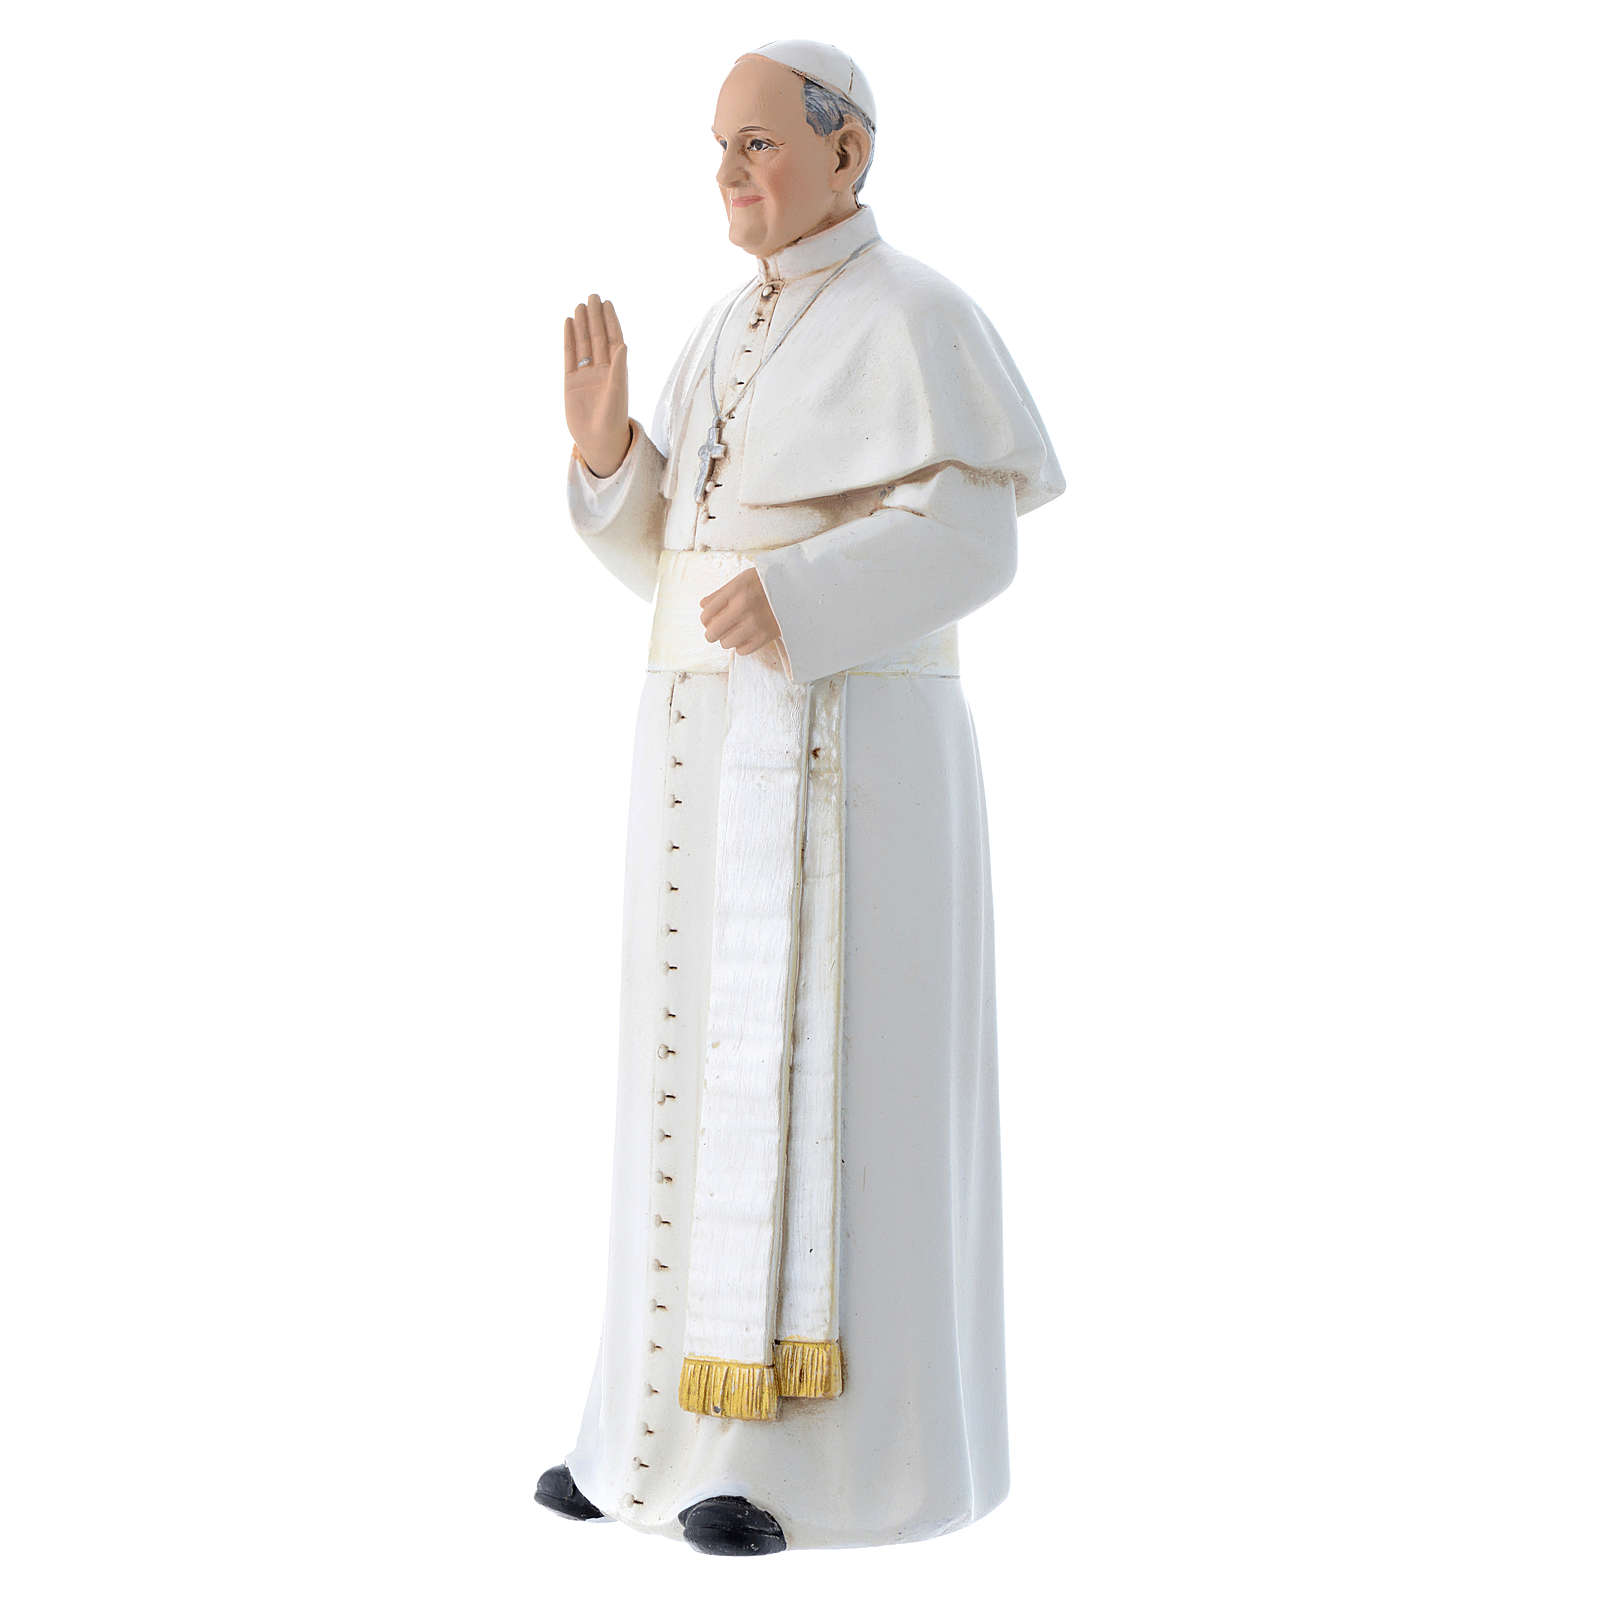 Statua Papa Francesco pasta legno colorata 15 cm 4